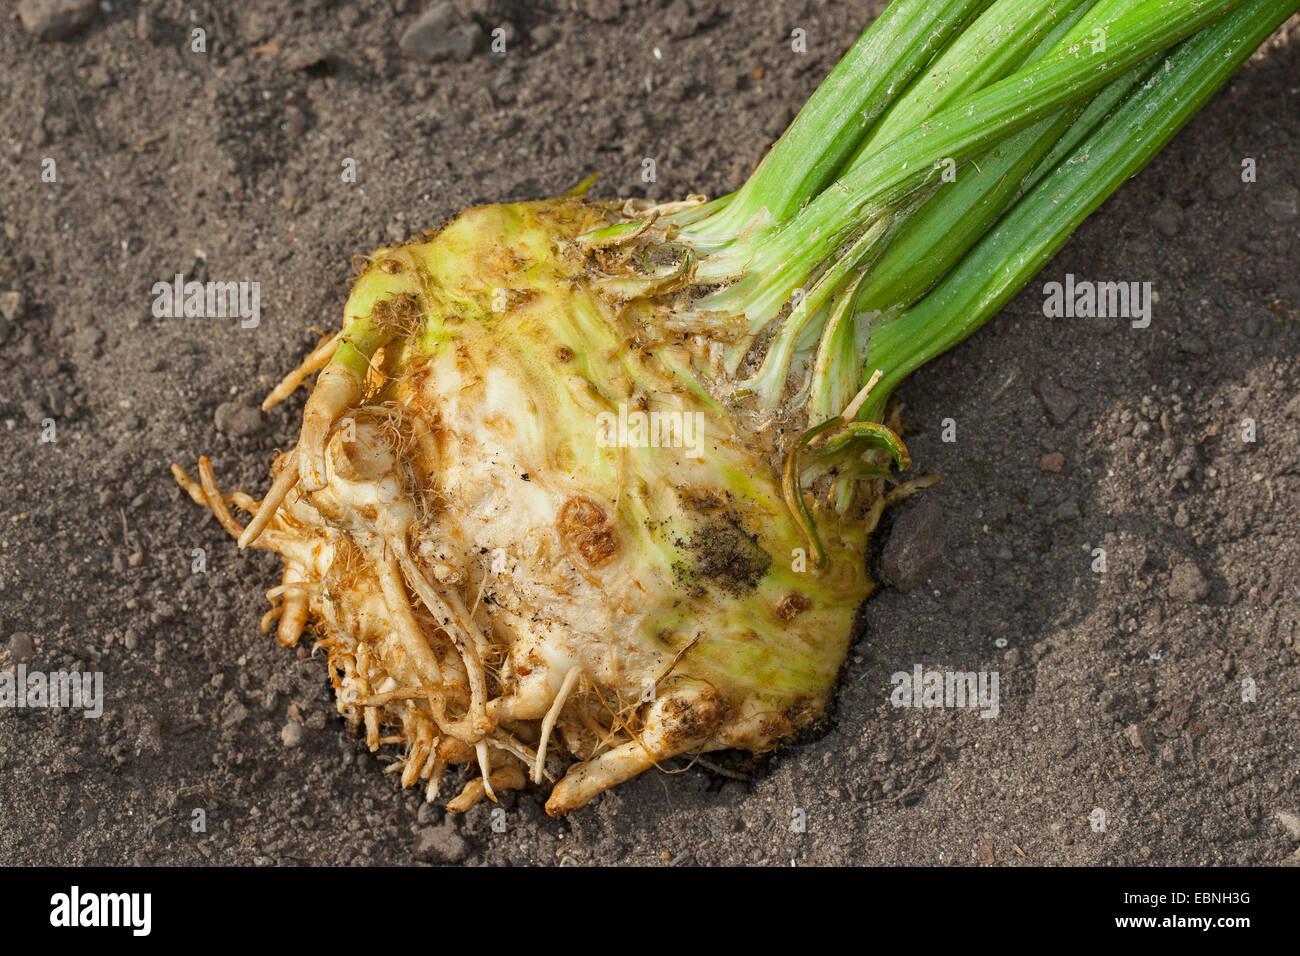 Celery, Celeriac, Turnip-rooted celery, Knob celery (Apium graveolens var. rapaceum, Apium graveolens rapaceum, - Stock Image